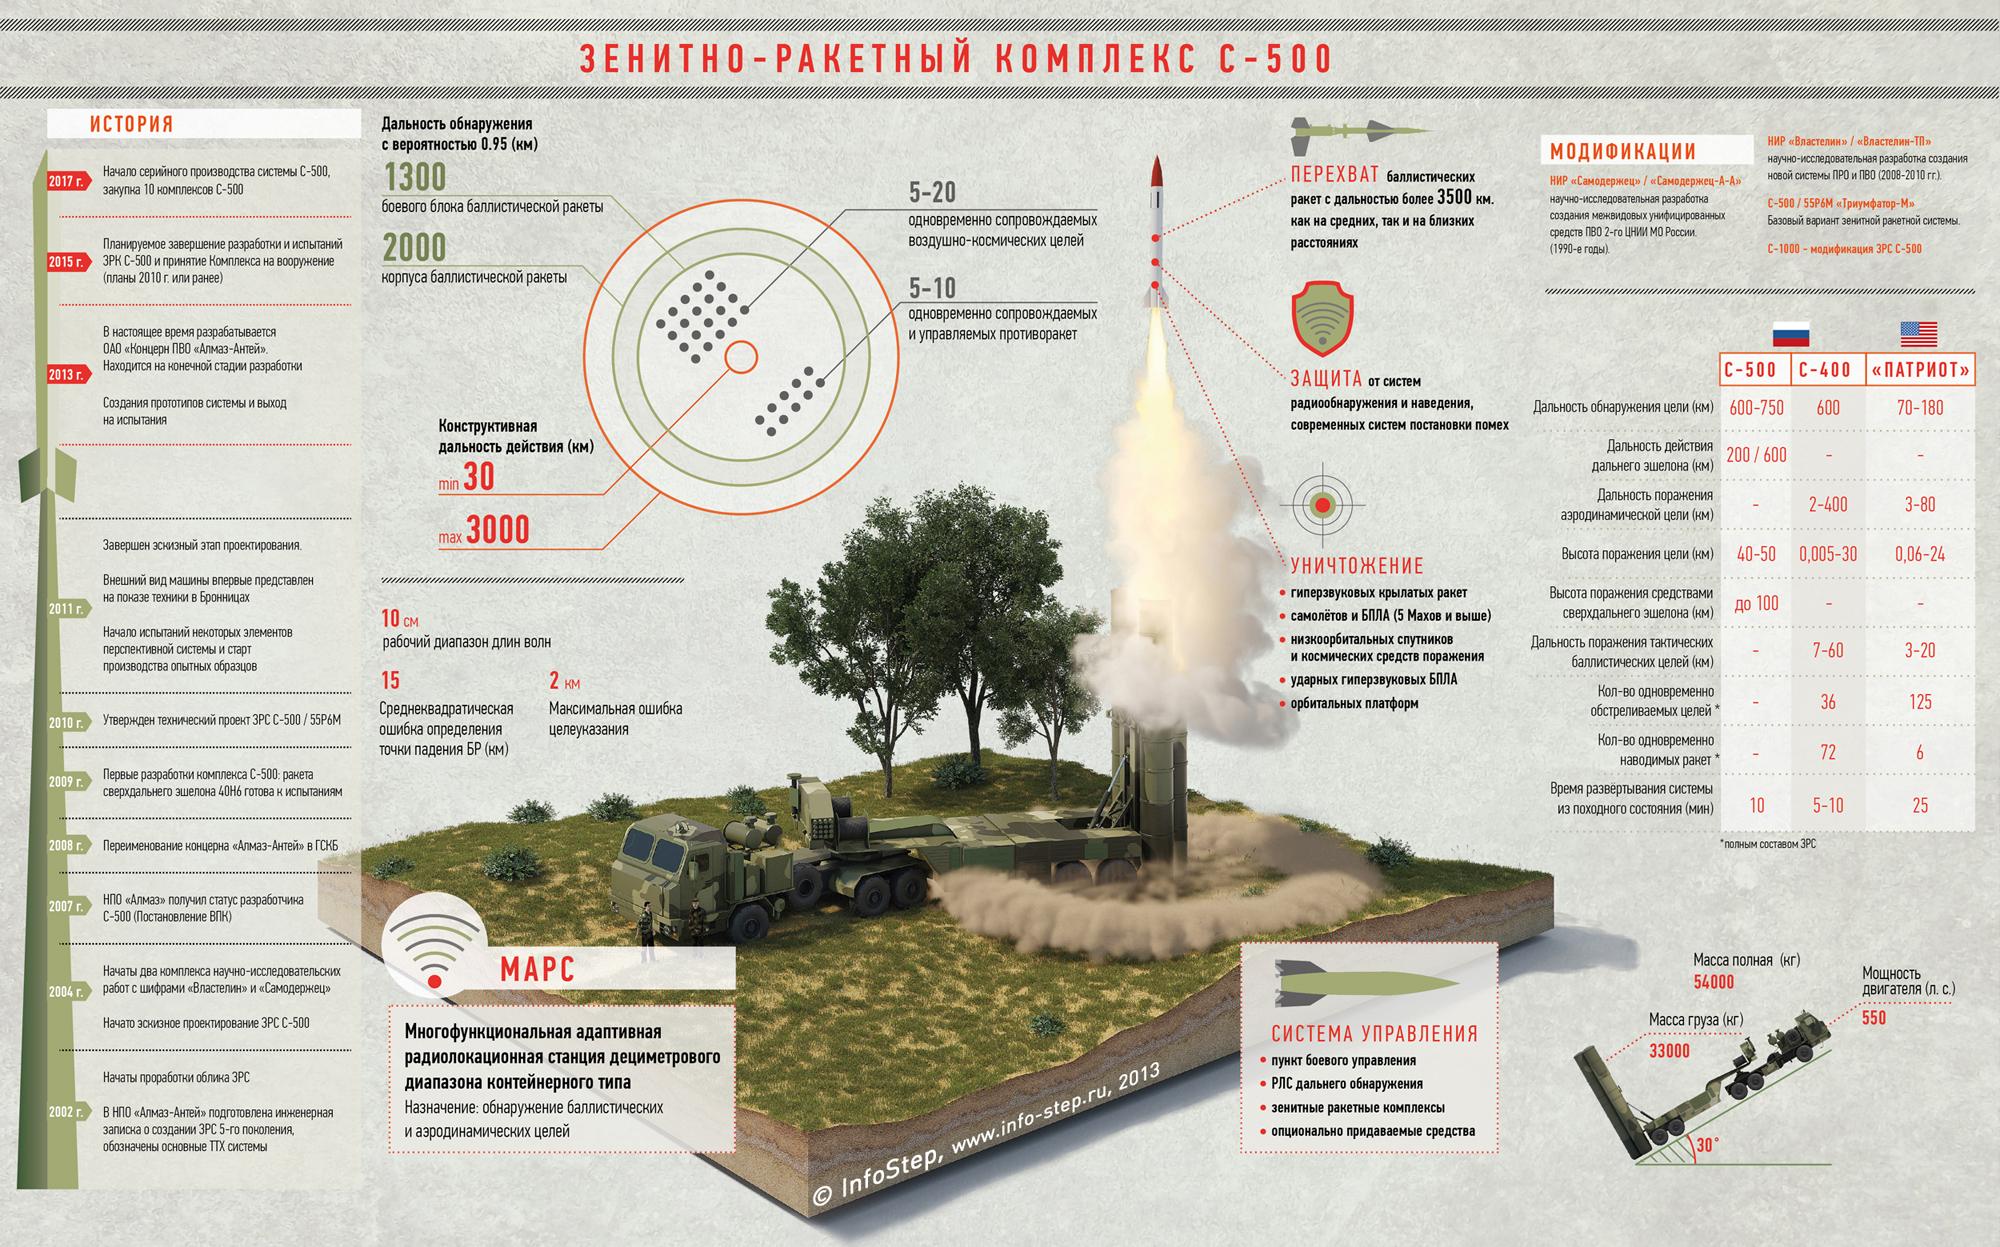 инфографика с-500